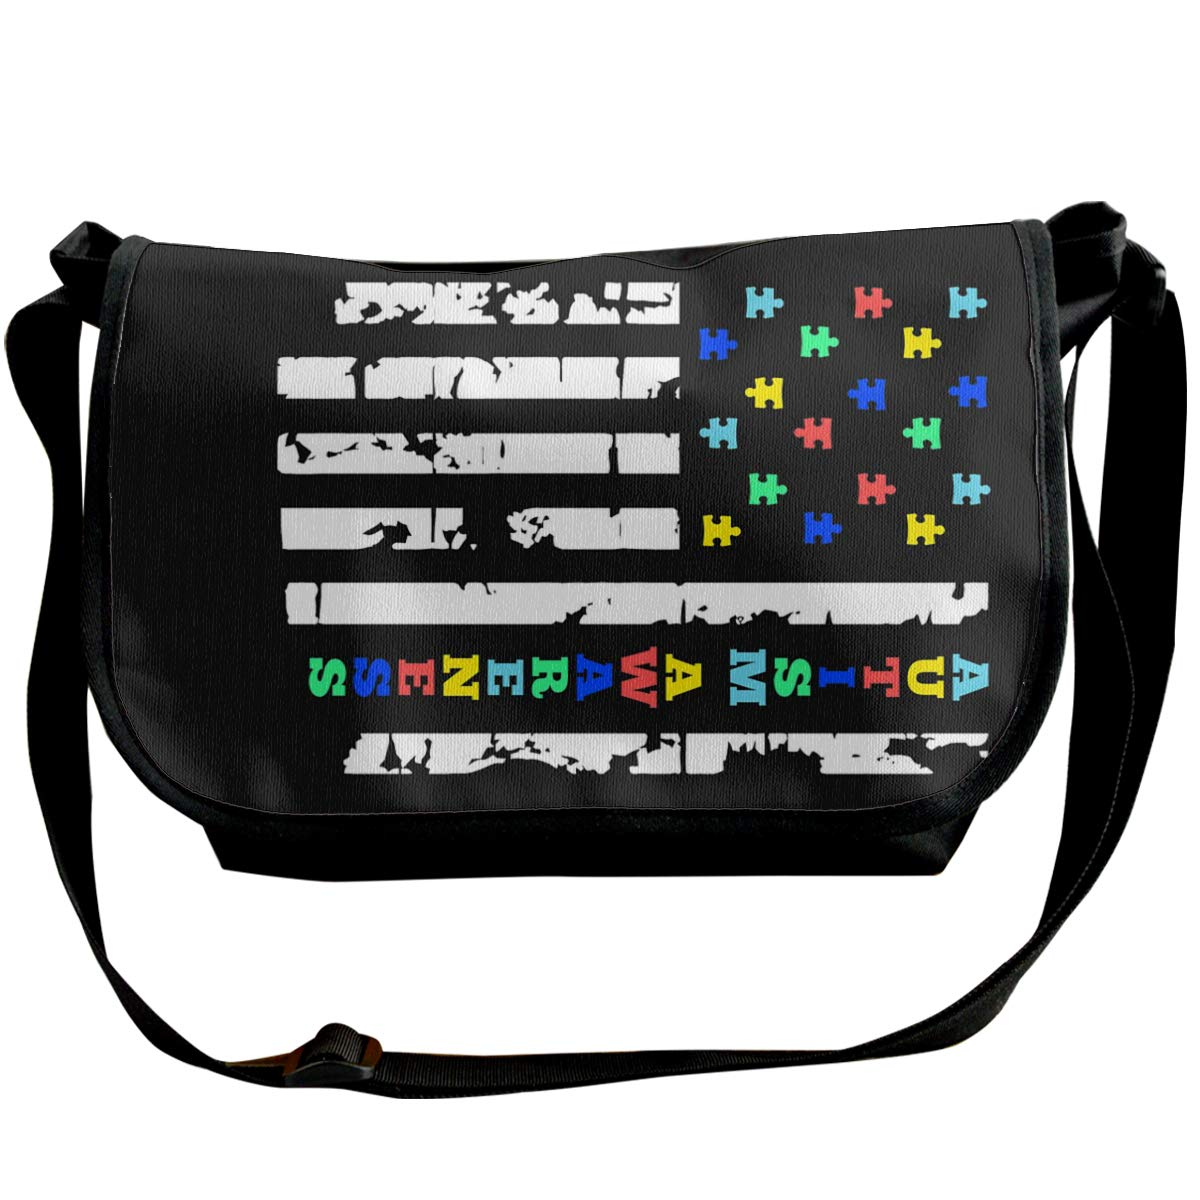 Futong Huaxia Autism Awareness Flag Travel Messenger Bags Handbag Shoulder Bag Crossbody Bag Unisex